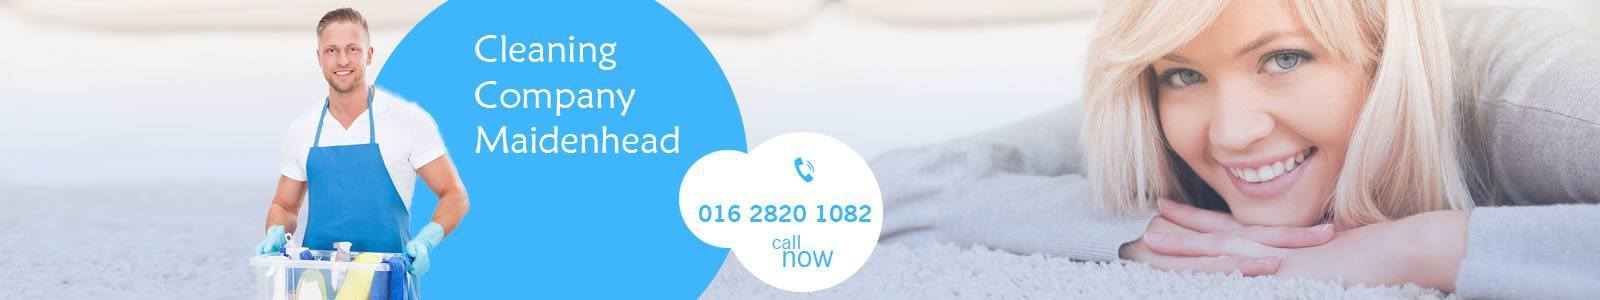 cleaning-company-maidenhead